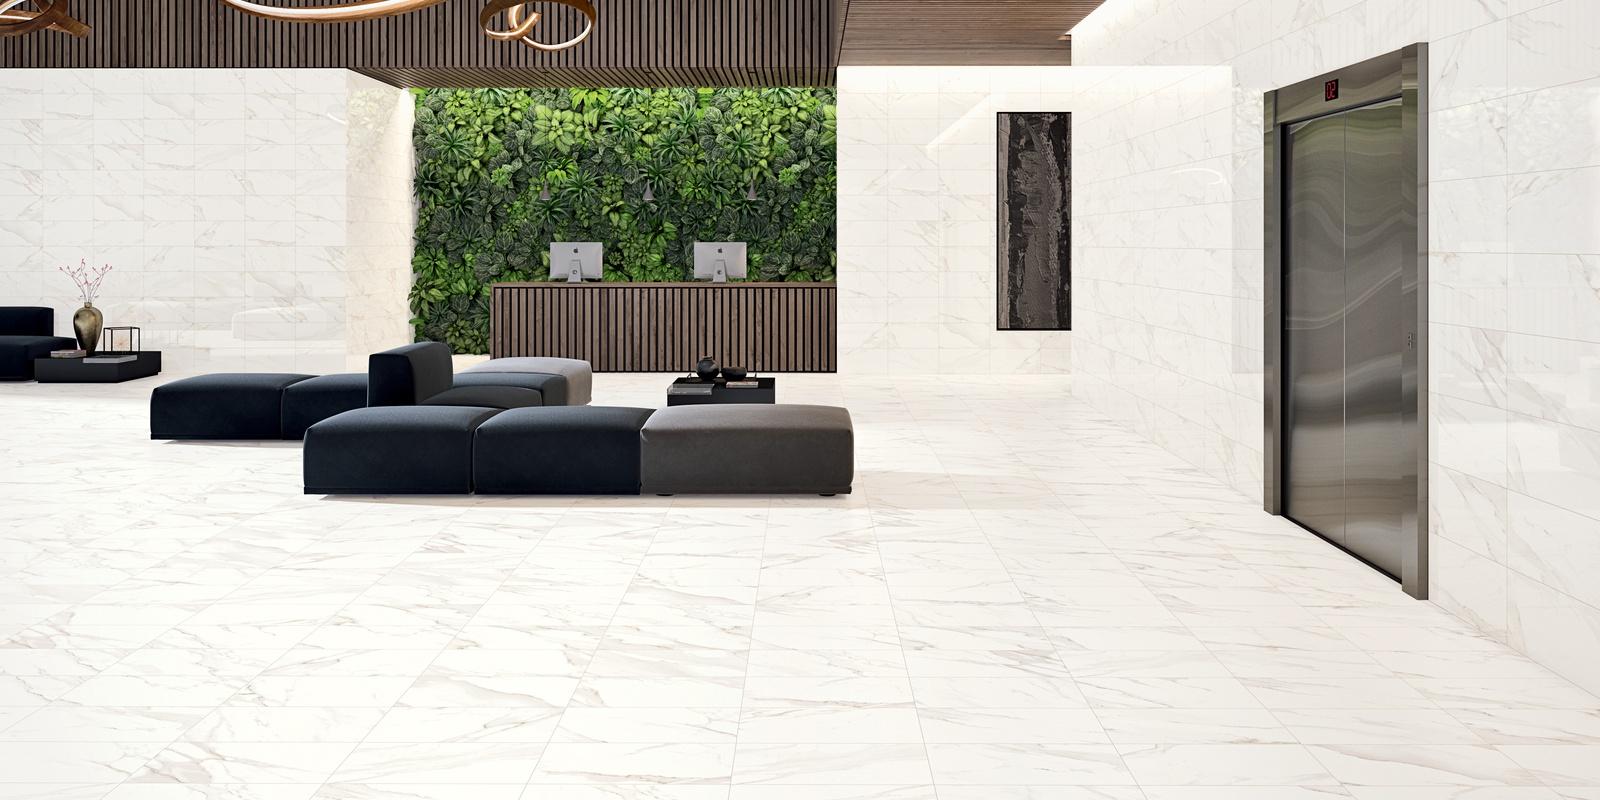 Ainslee Park Hdp A Vintage Marble Look Floor Wall Tile Florida Tile